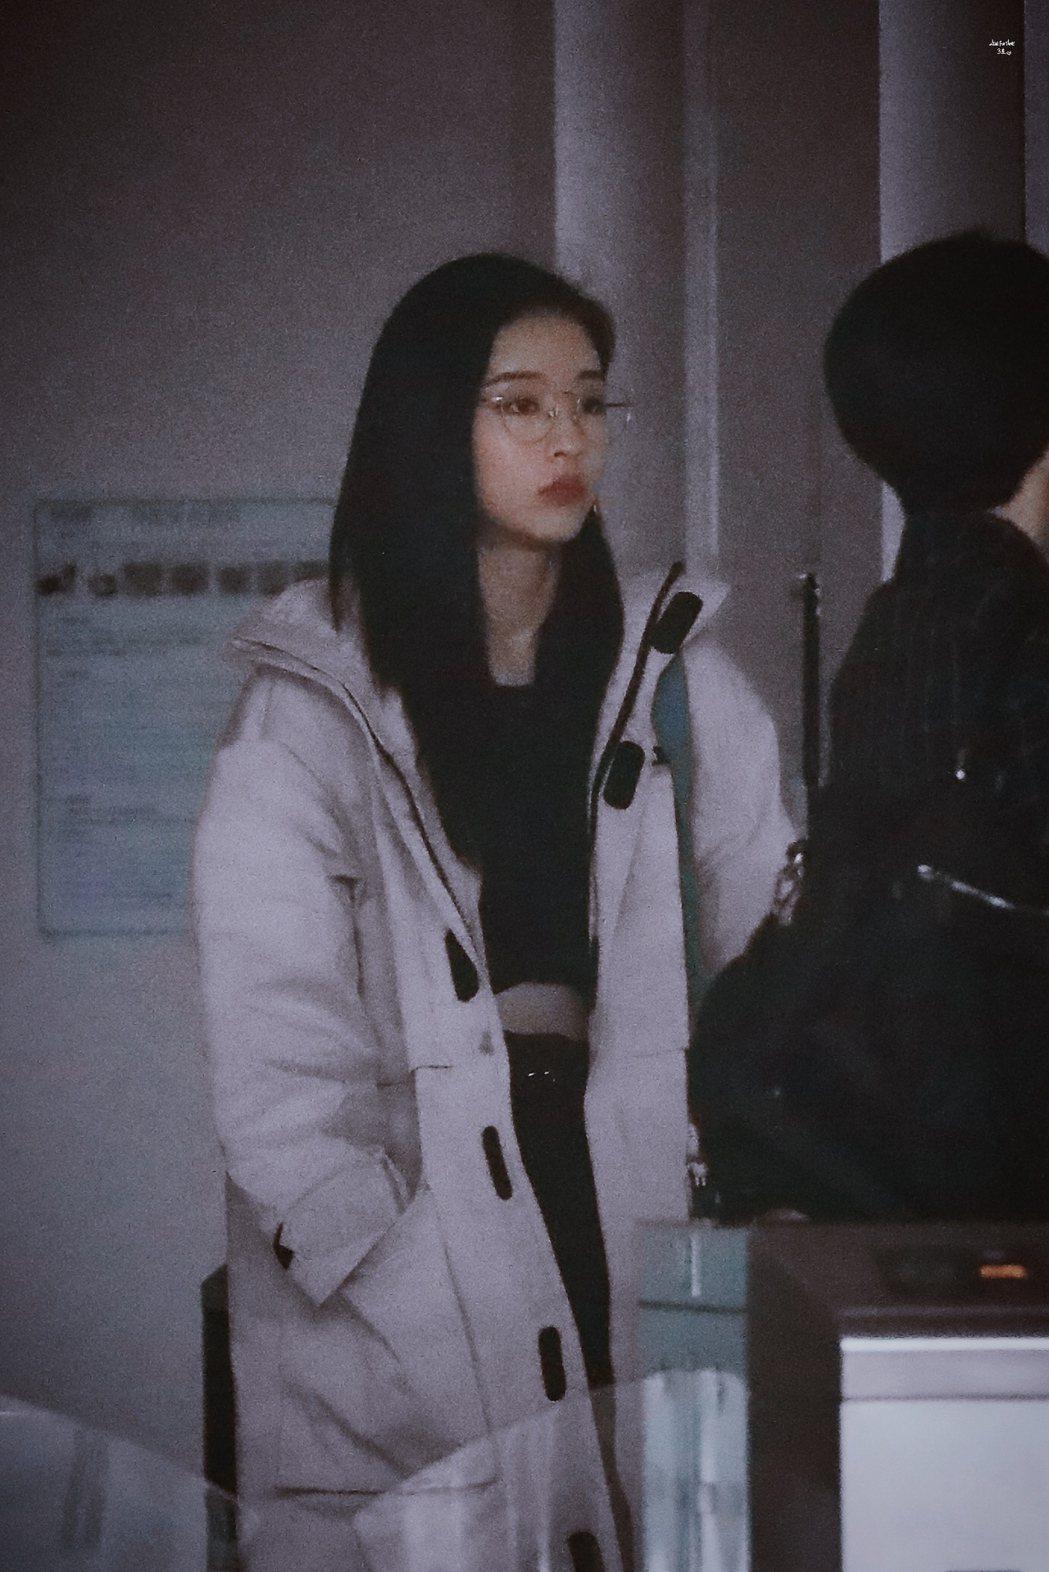 SNH48成員孫芮參加了「青春有你2」。圖/擷自微博